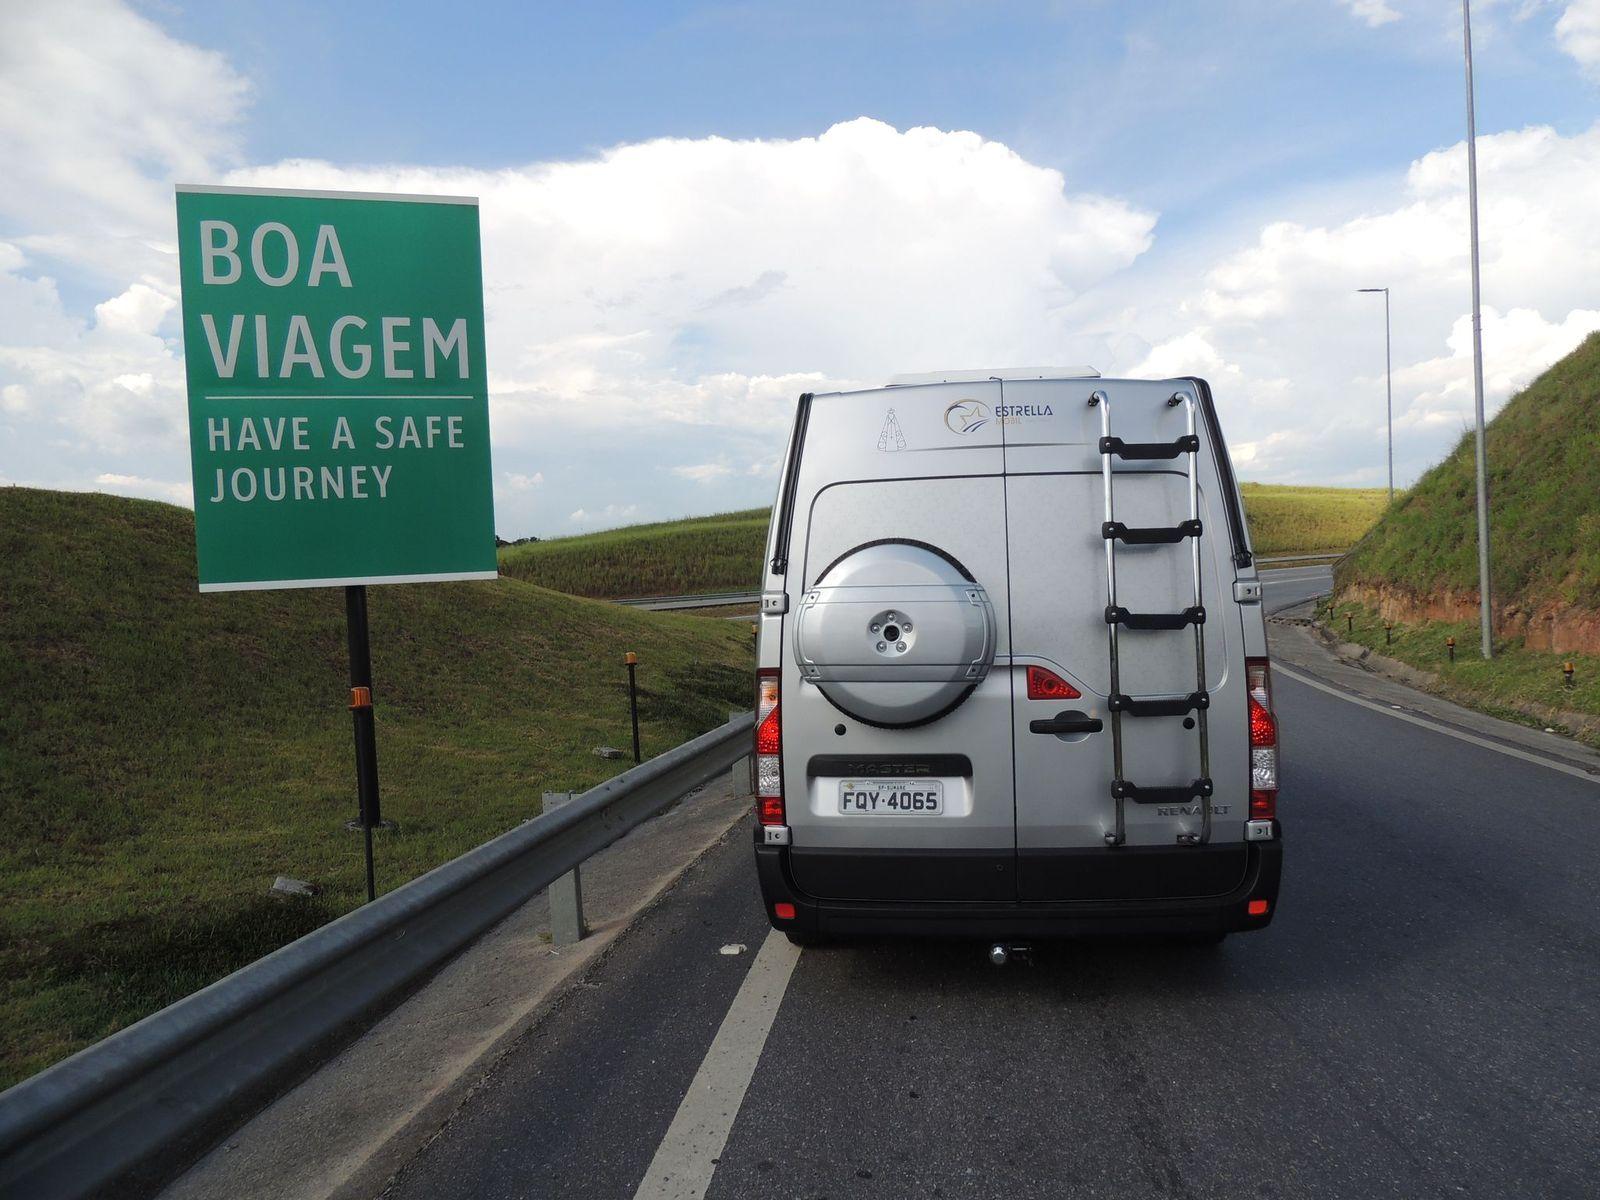 Motorhome novos modelos chegam ao Brasil